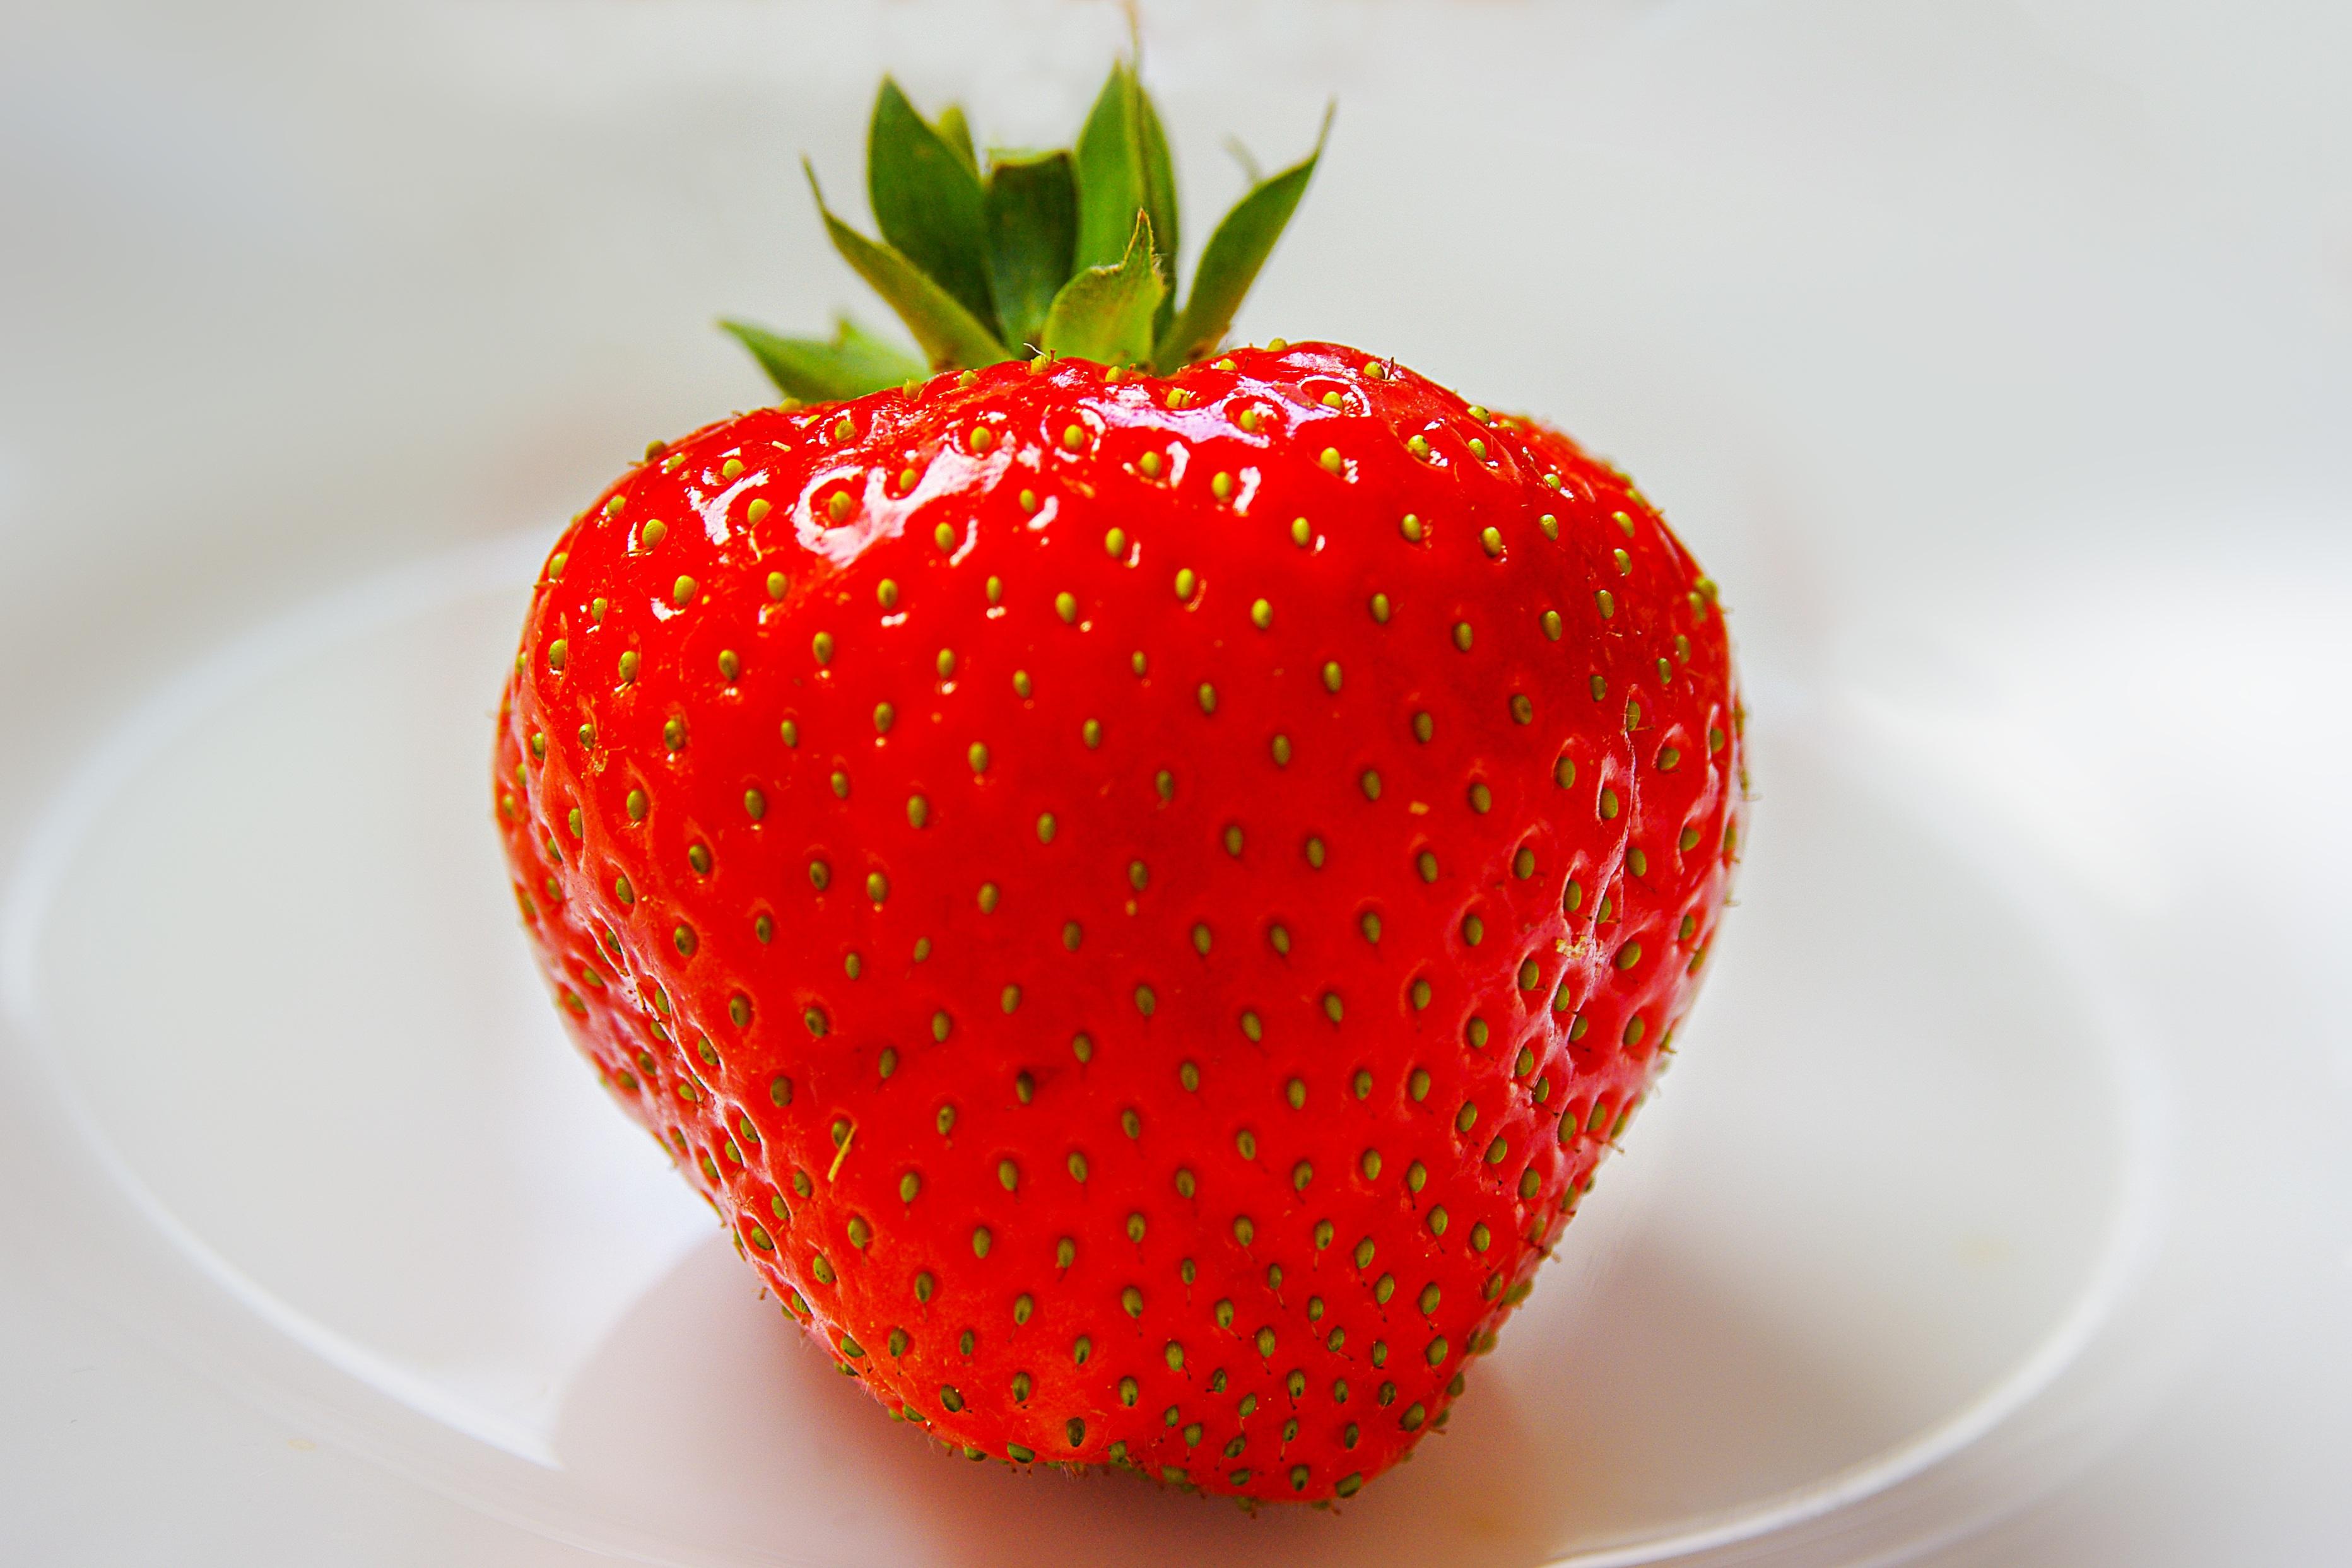 Картинка ягод клубники